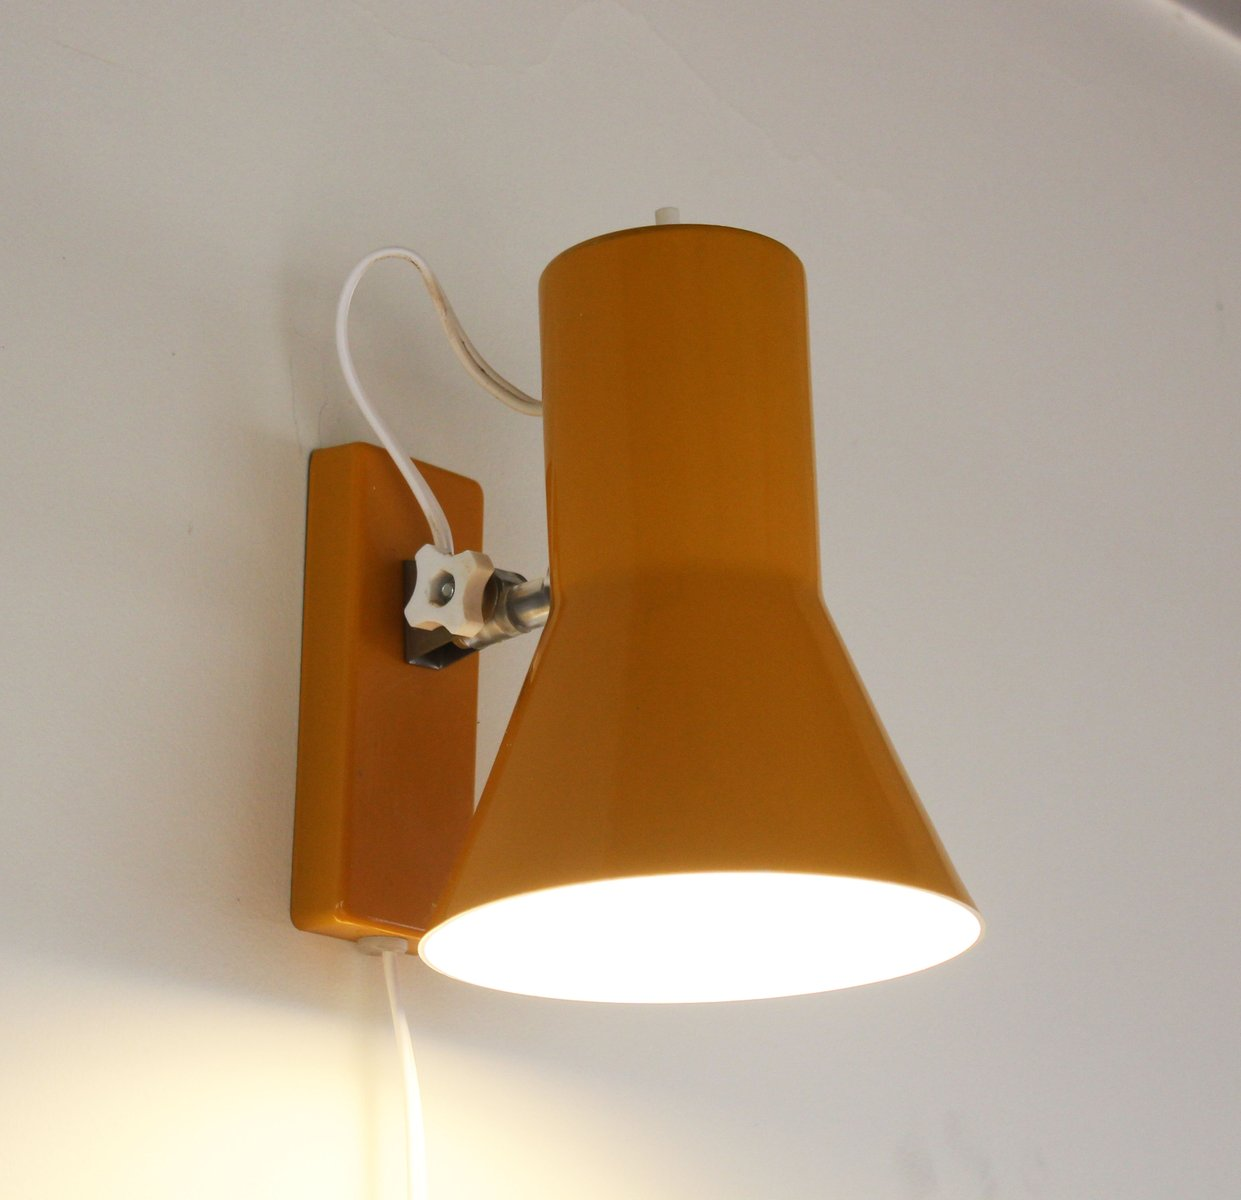 Lampe De Bureau Jaune Mid Century Danemark En Vente Sur Pamono